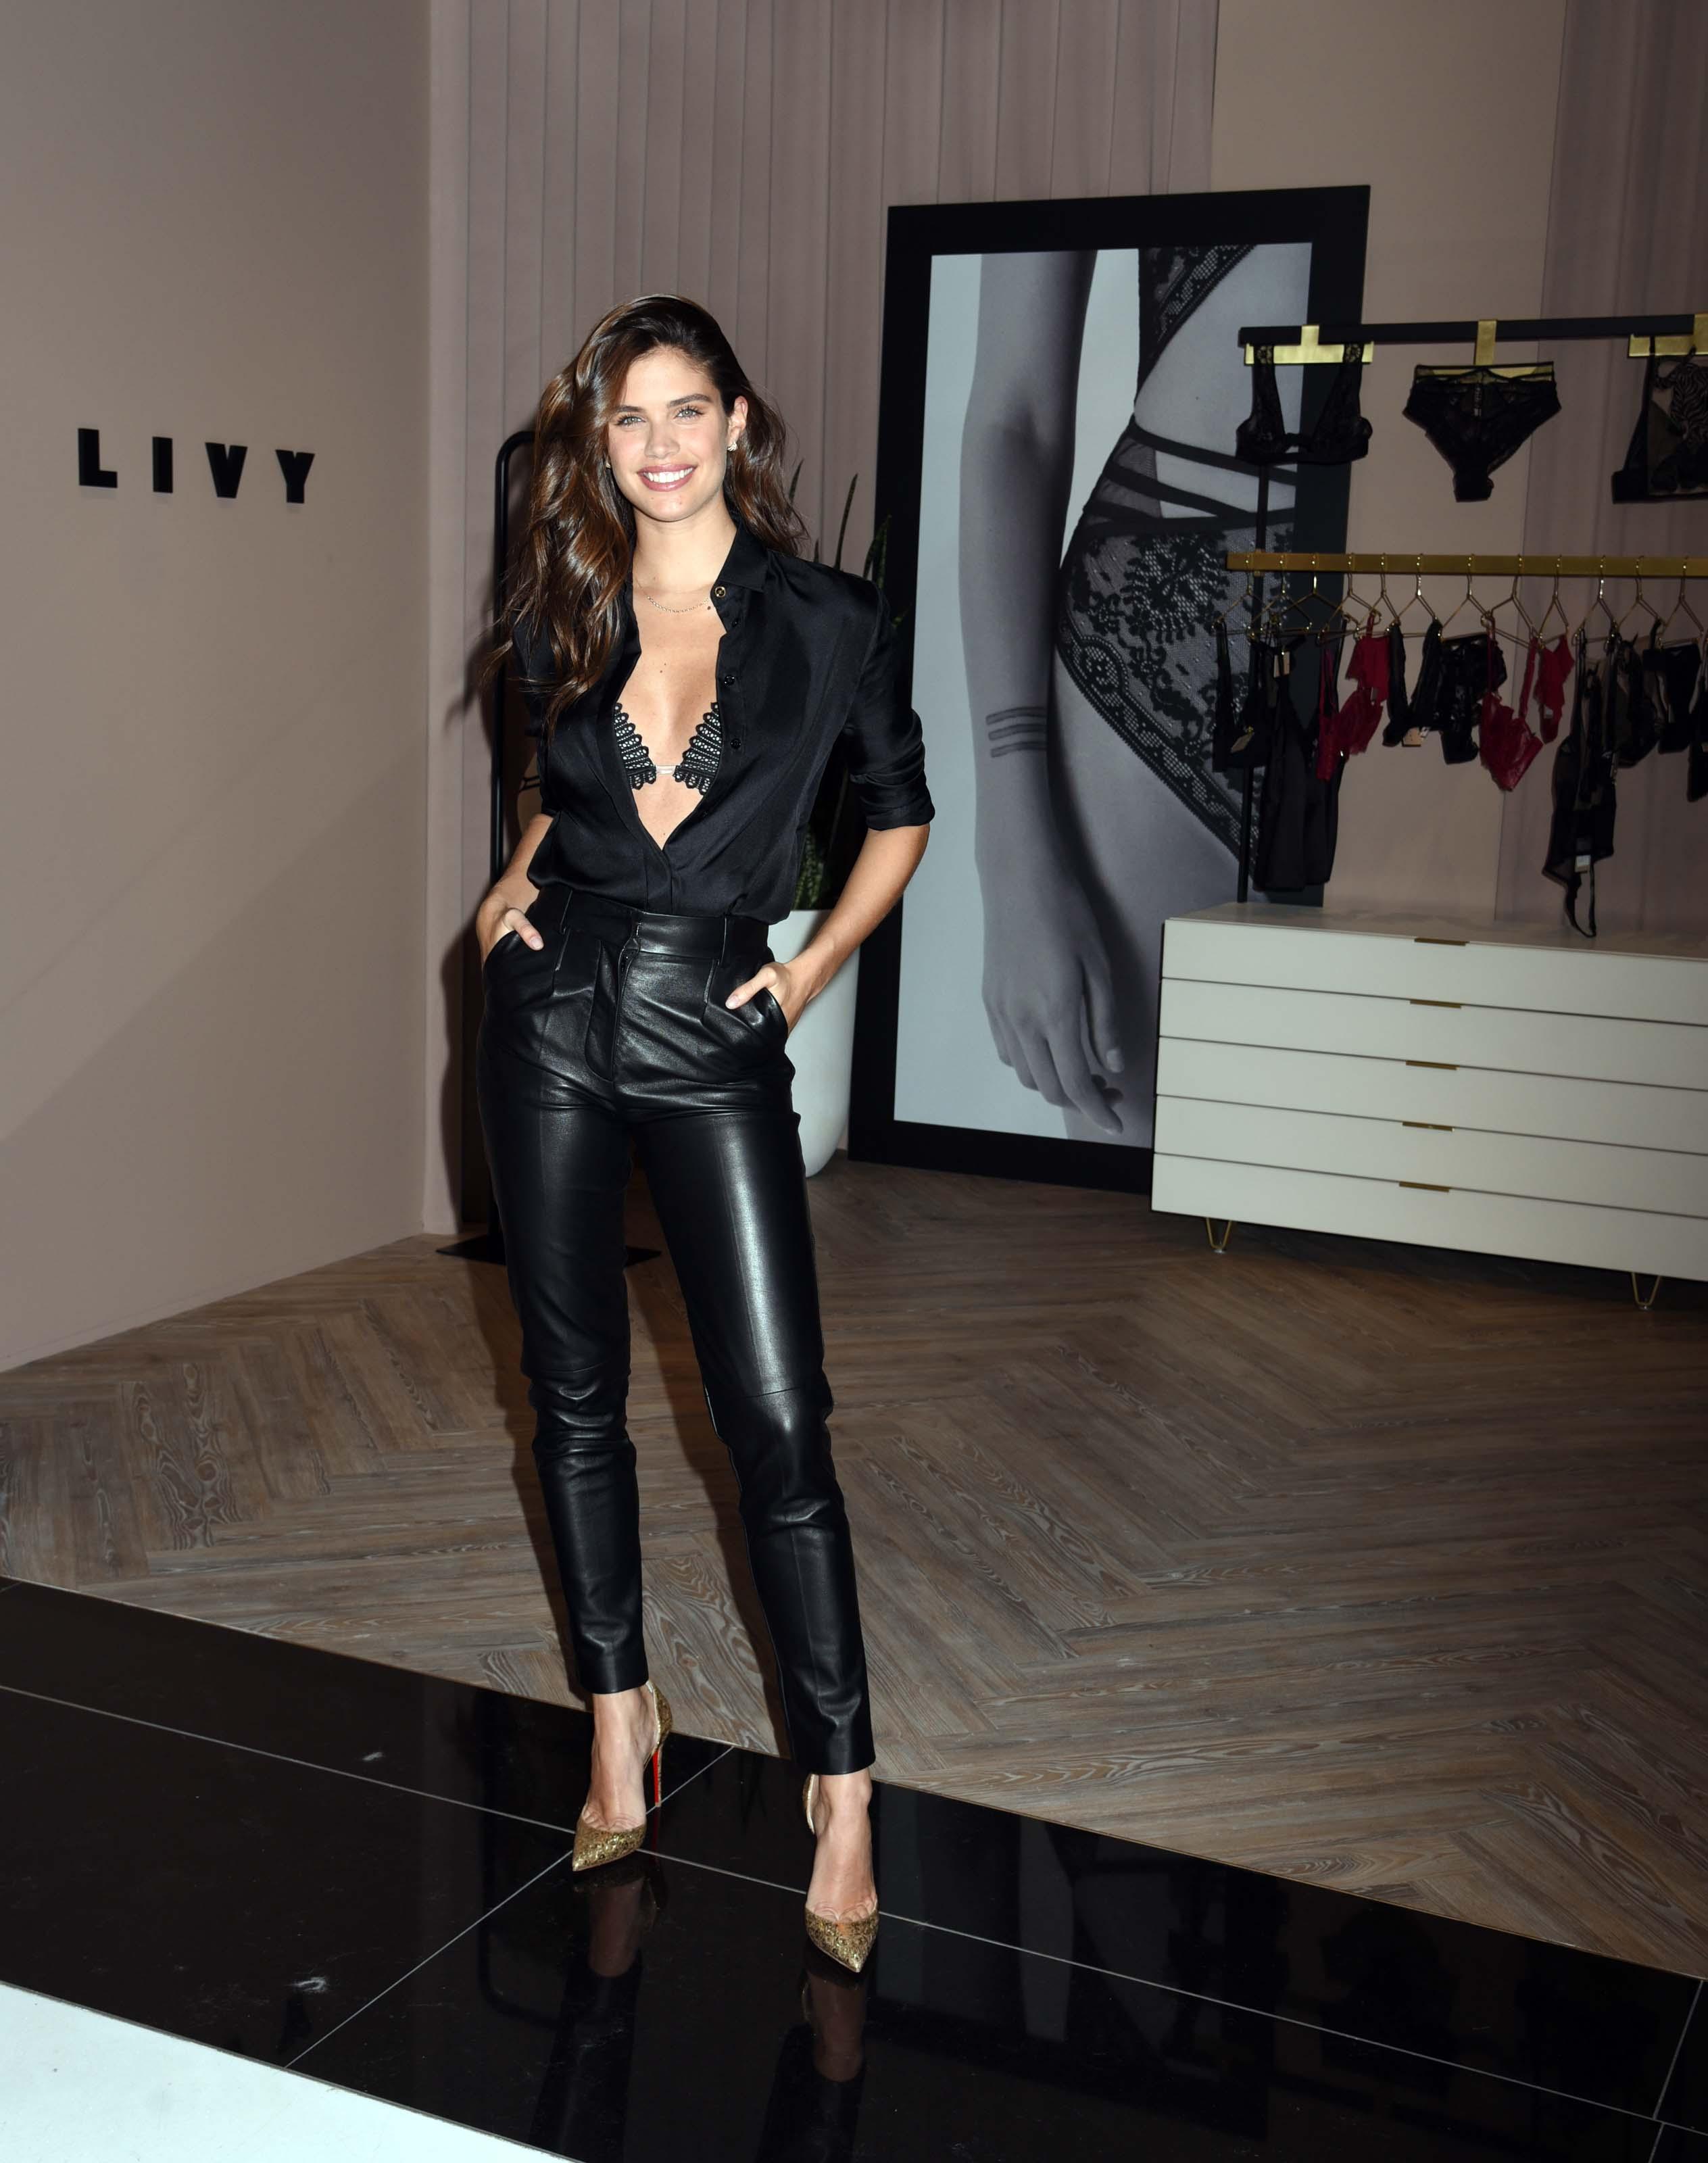 Sara Sampaio attends LIVY lingerie celebration at Victoria's Secret